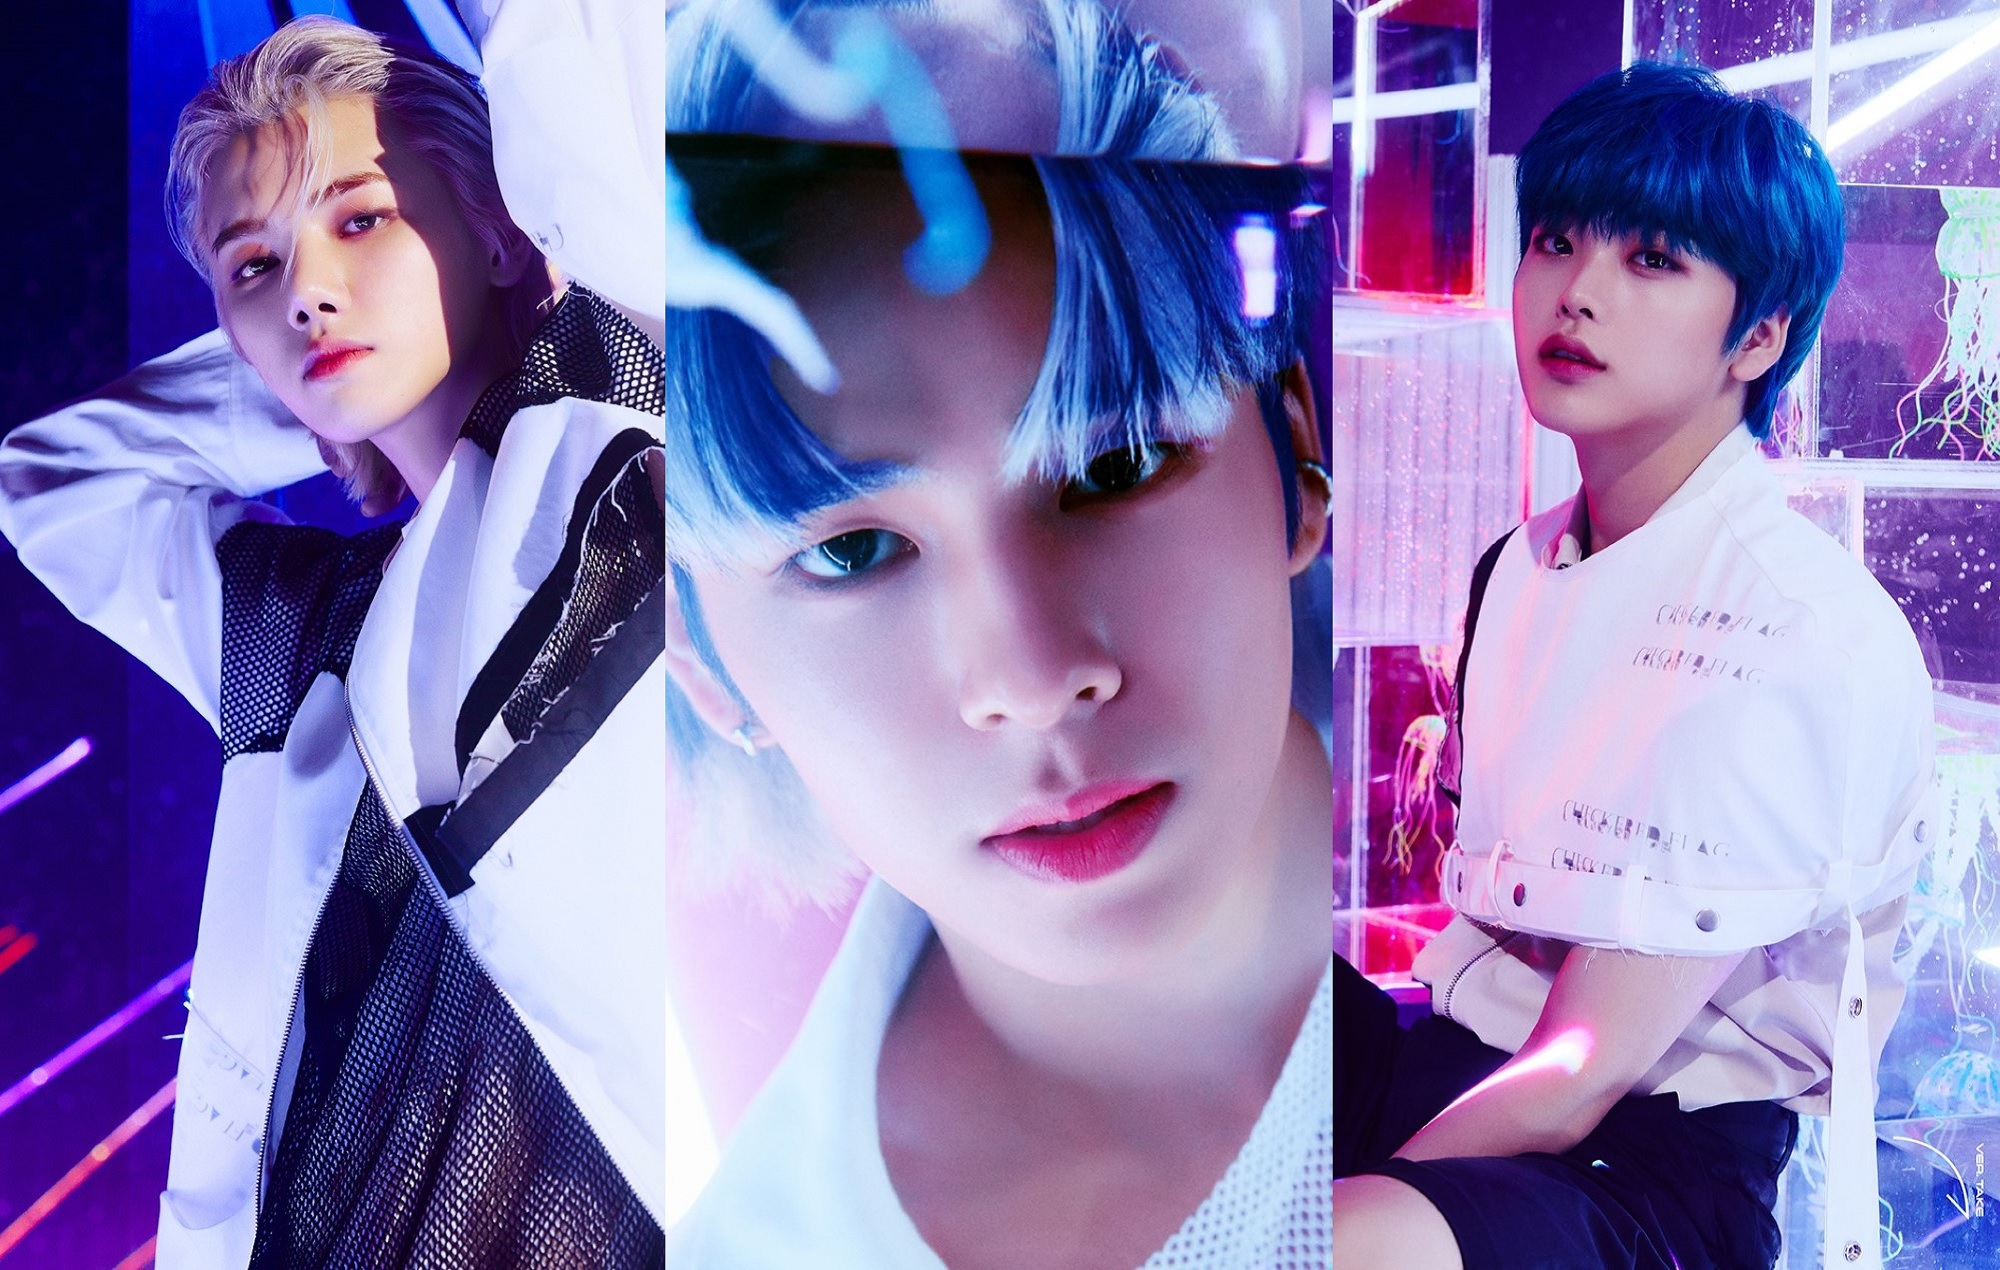 cravity the awakening written in the stars interview rising boyband k-pop